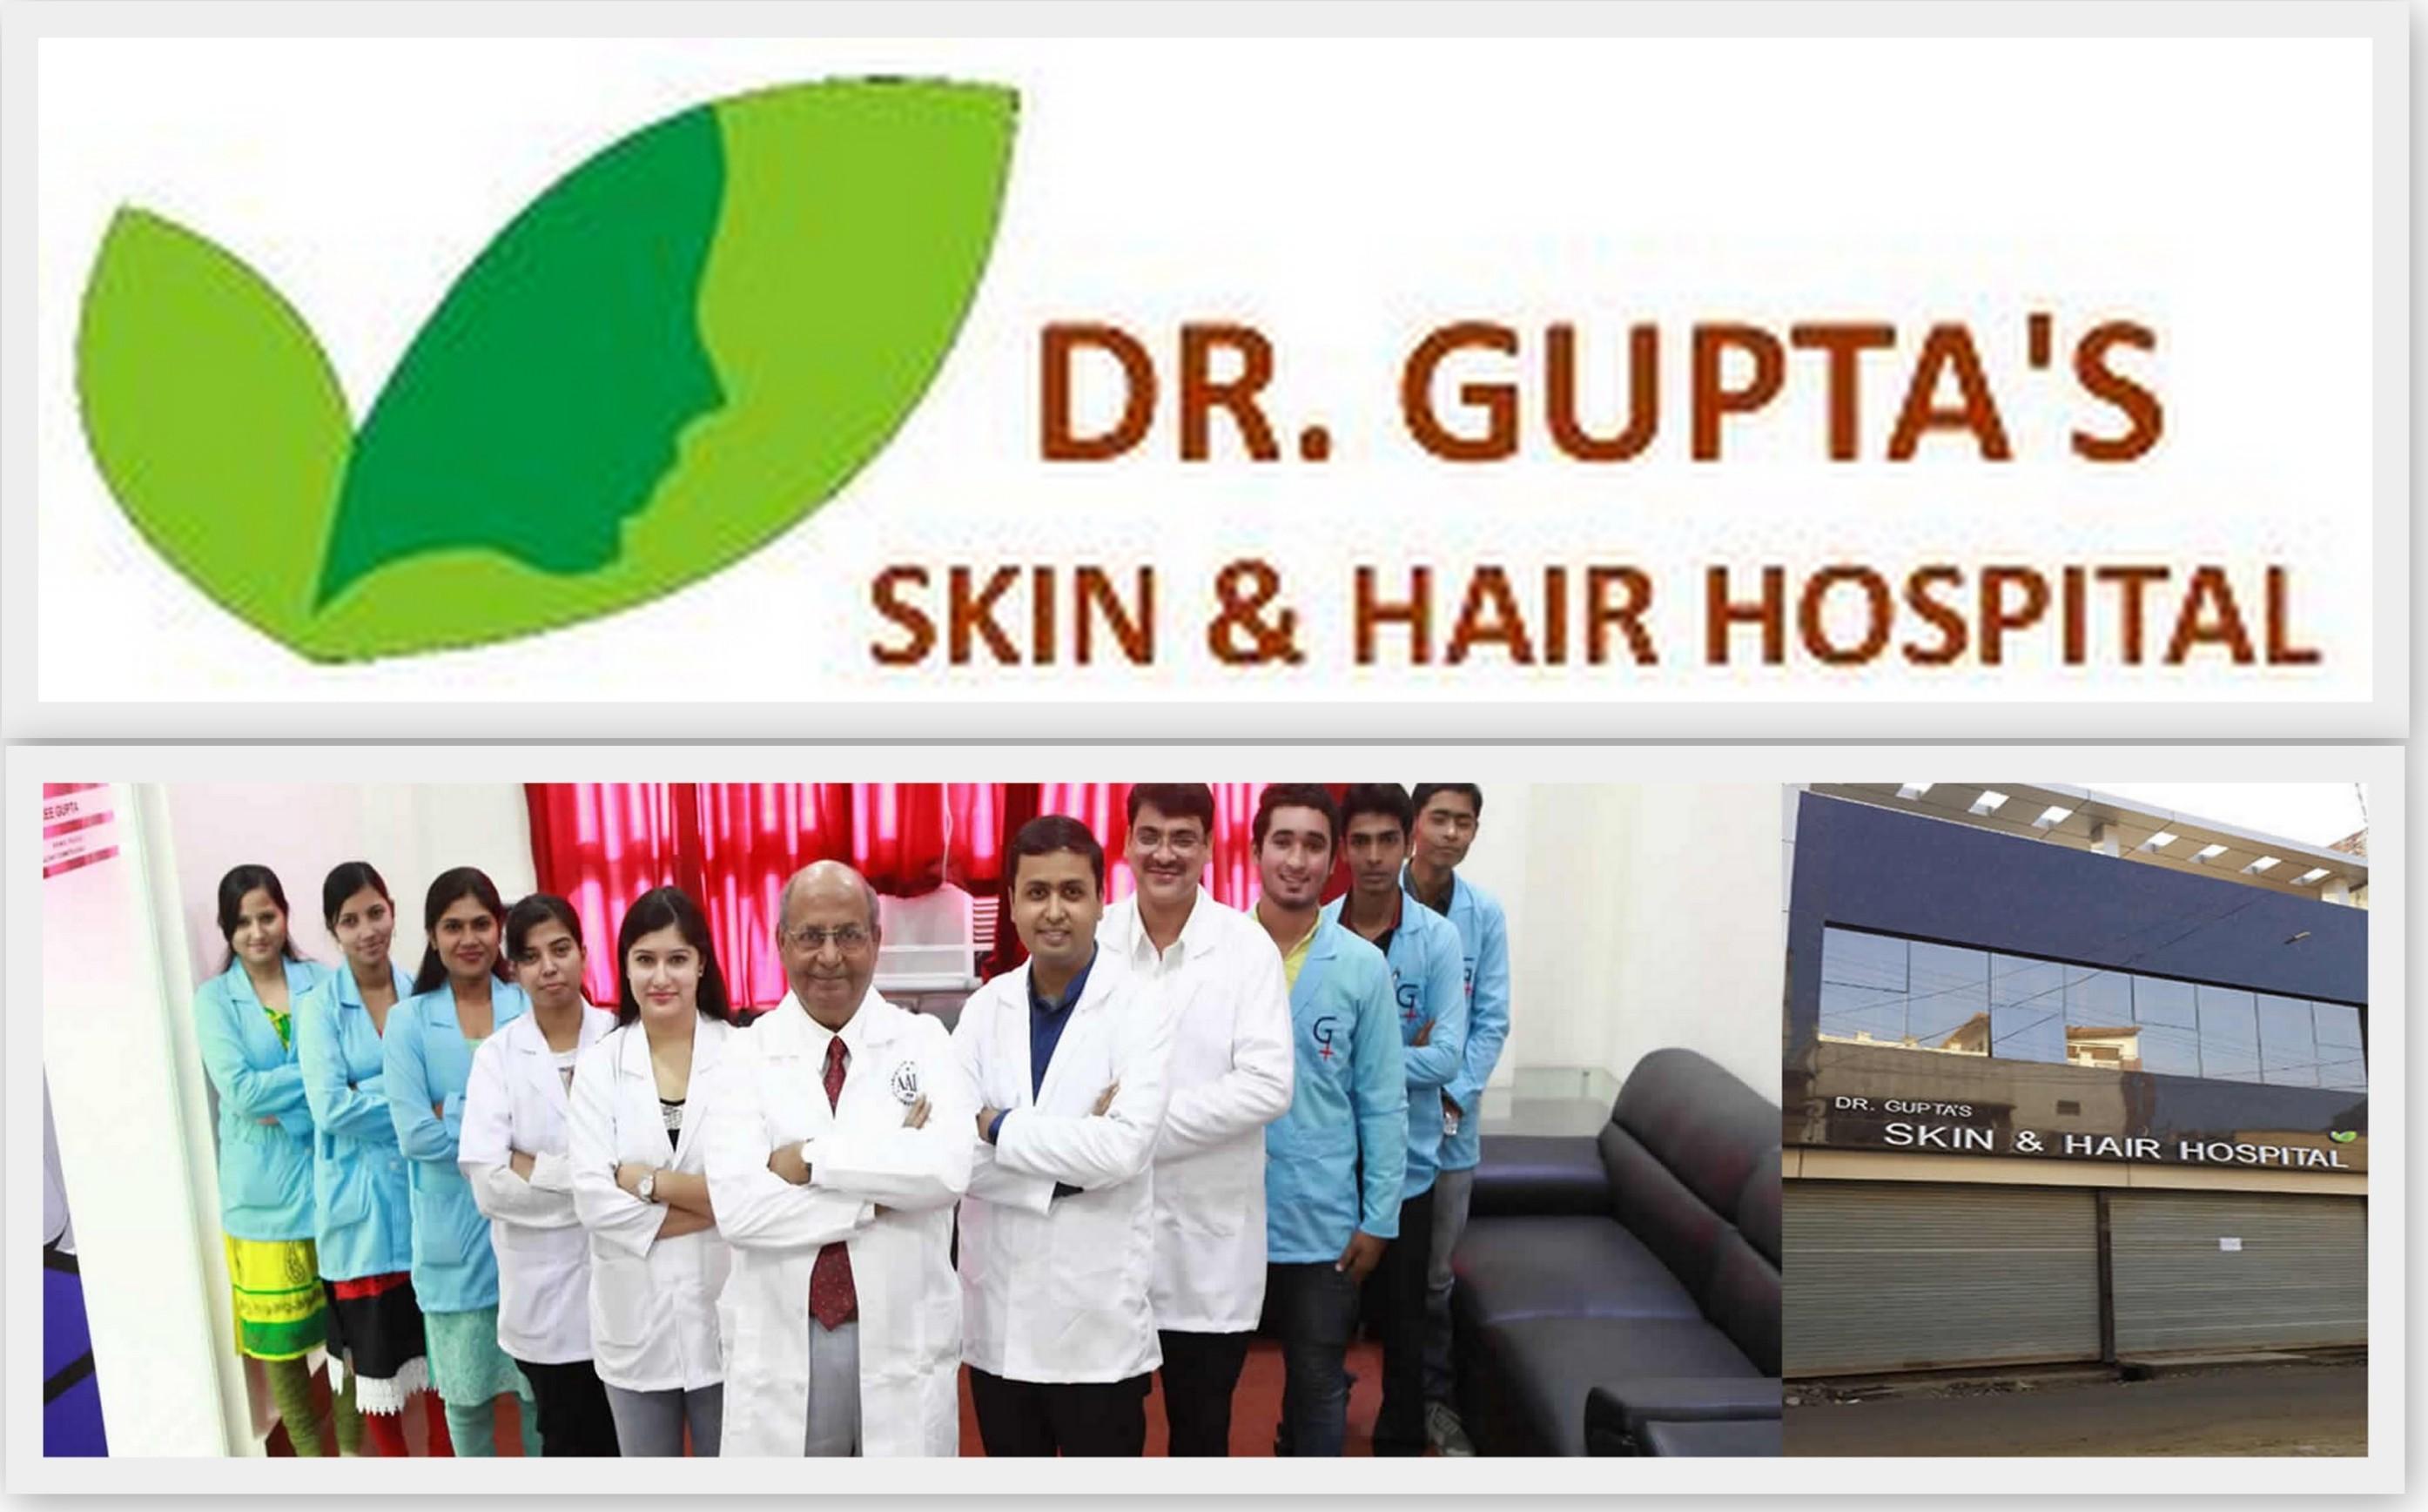 Dr. Gupta's Skin and Hair Hospital